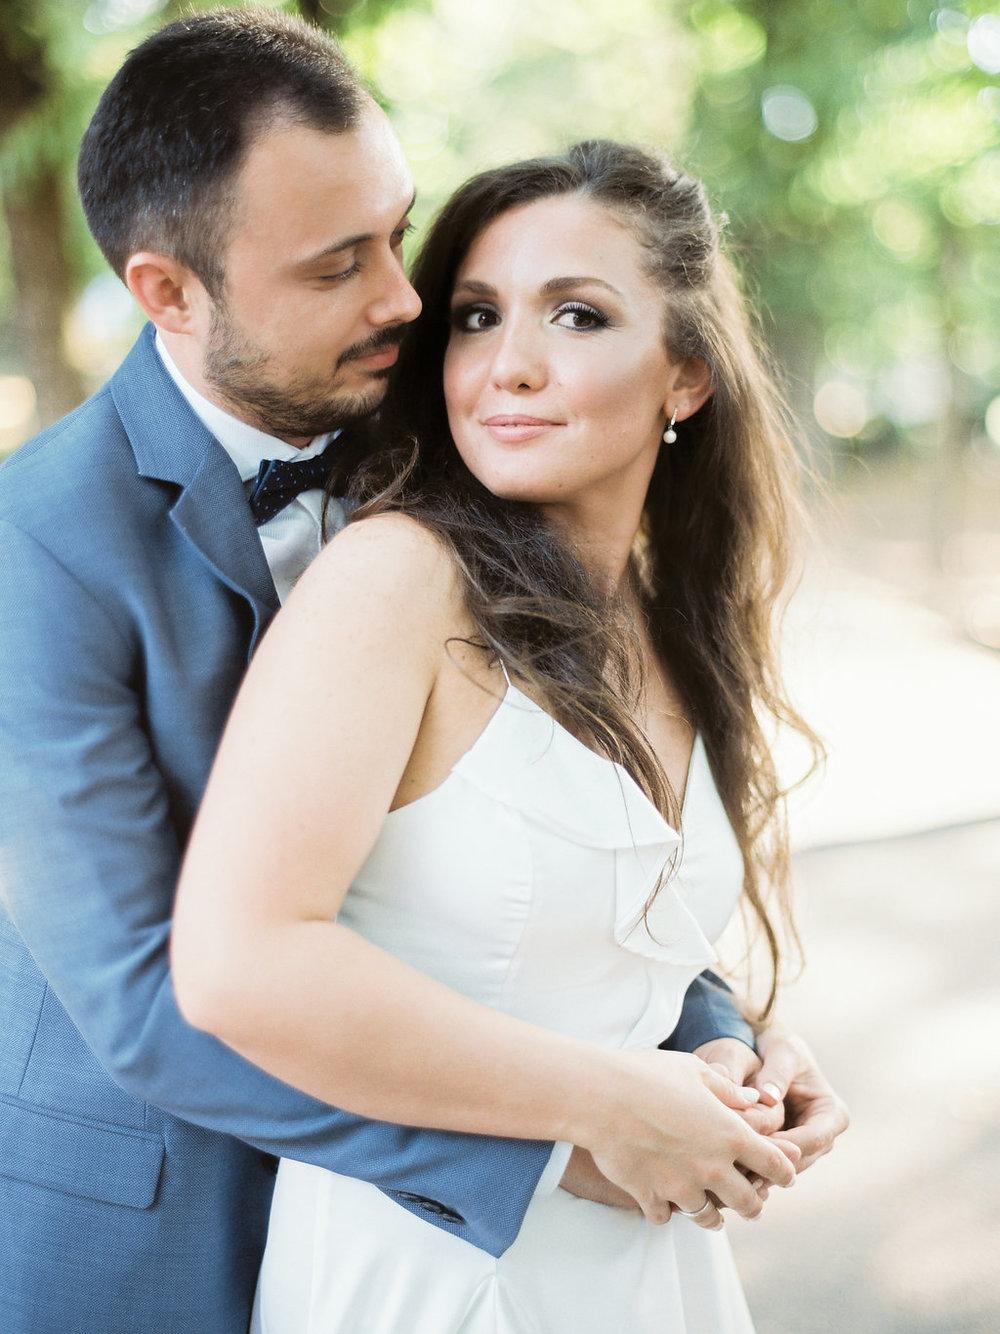 TamaraGigola,Georgia,couplefromIsrael,Tinandali-0044-2.JPG